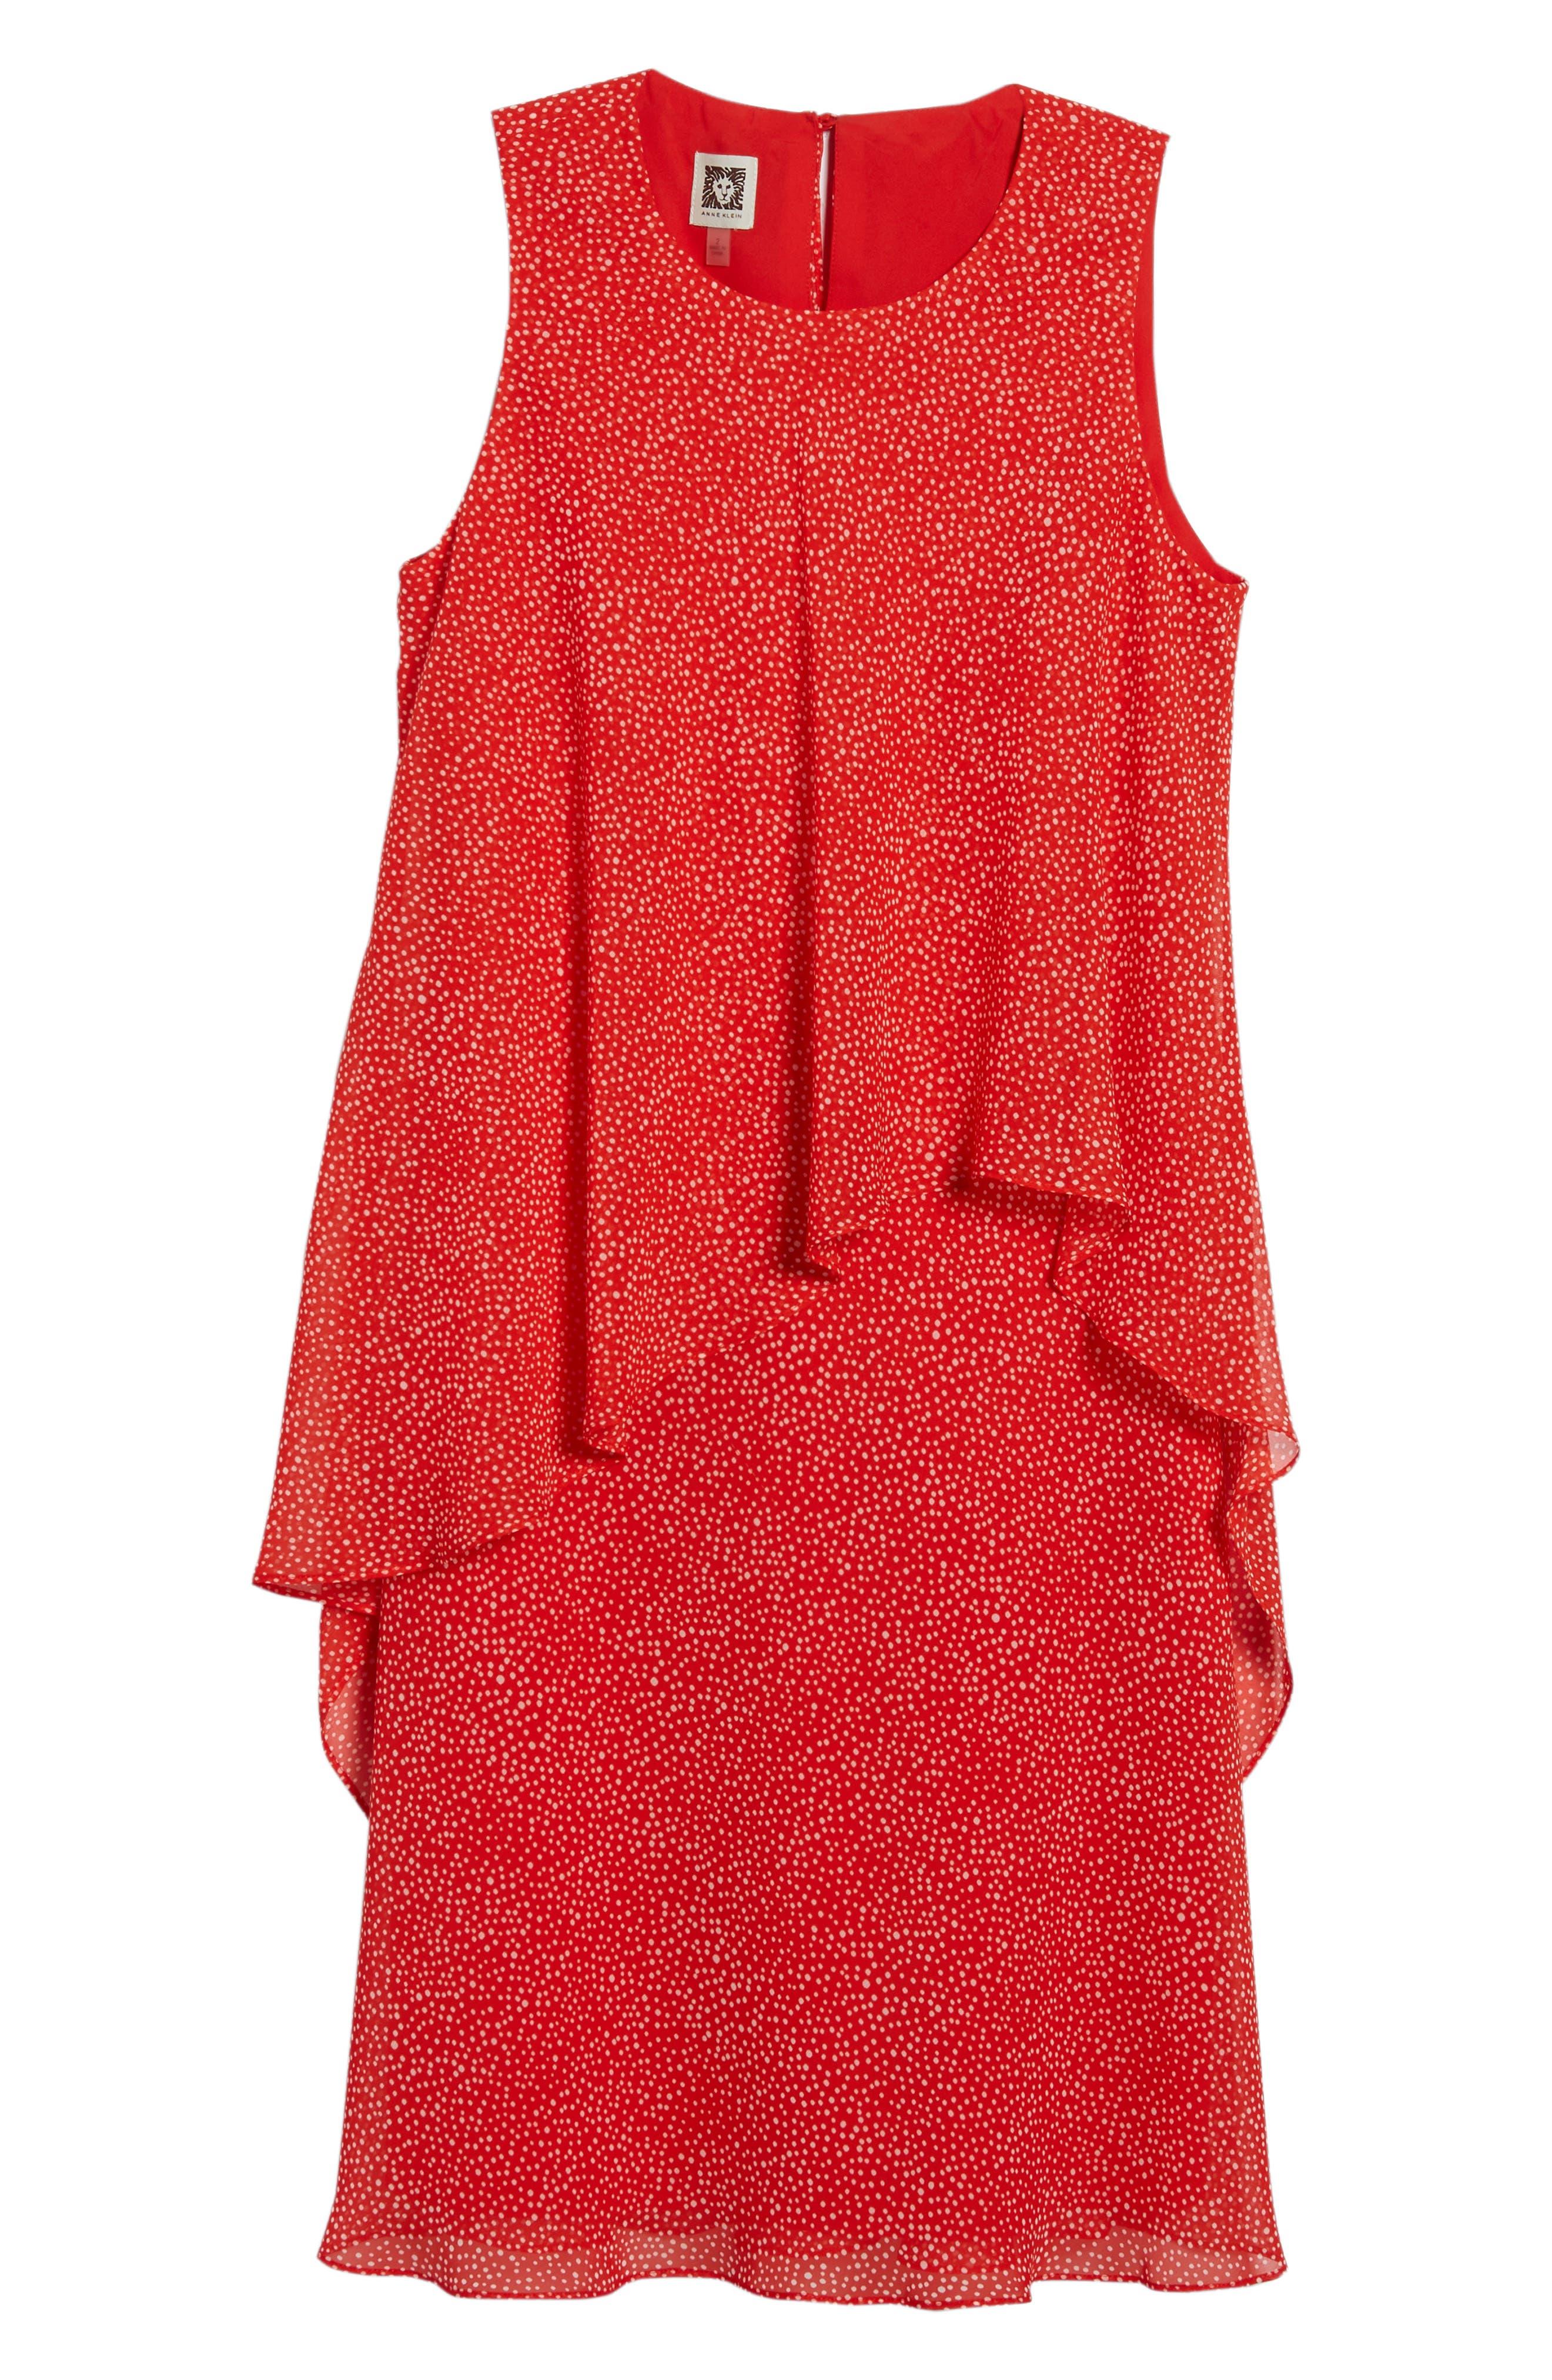 Chiffon Overlay A-Line Dress,                             Alternate thumbnail 6, color,                             Tomato/ White